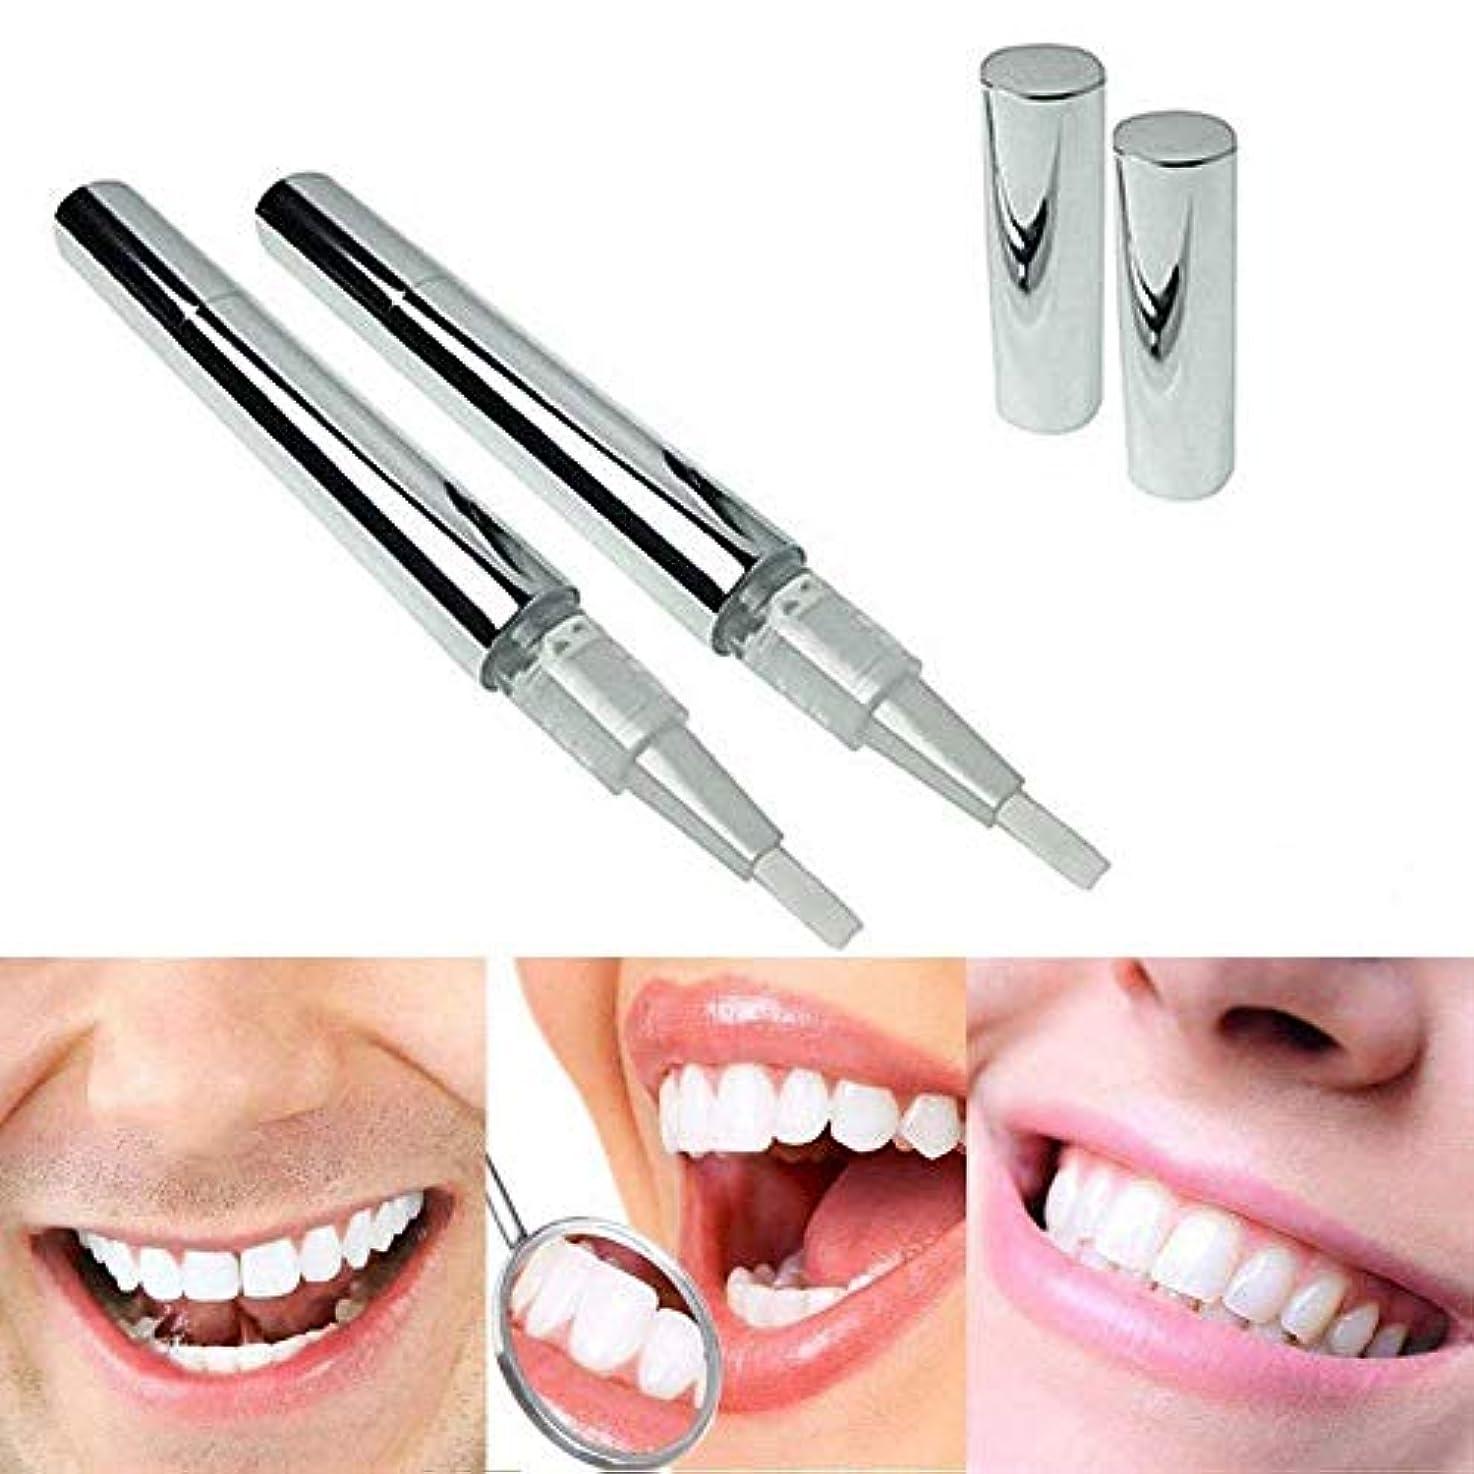 MercuryGo 美白歯ゲル 歯 ホワイトニングペン ホワイトニングペン 歯ブラシ 輝く笑顔 口臭防止 歯周病防止 2本